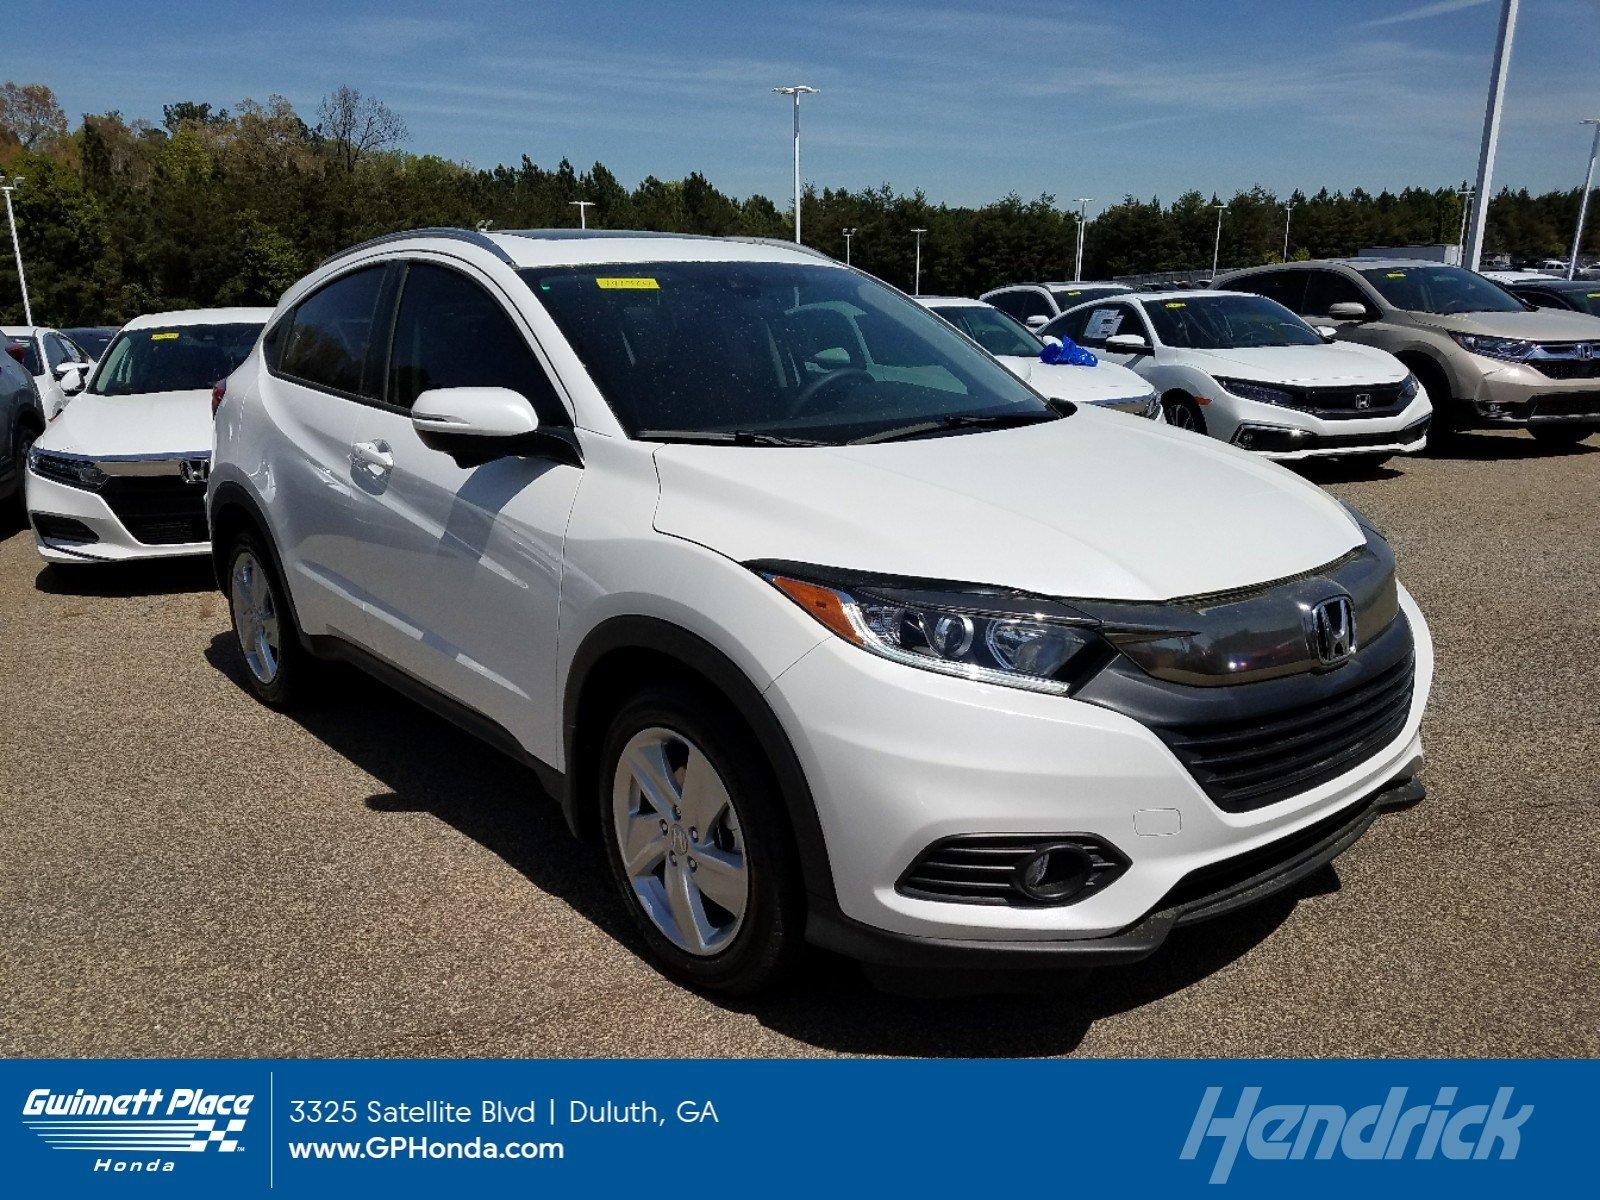 New 2019 Honda HR-V EX 2WD CVT SUV for sale in Duluth, GA